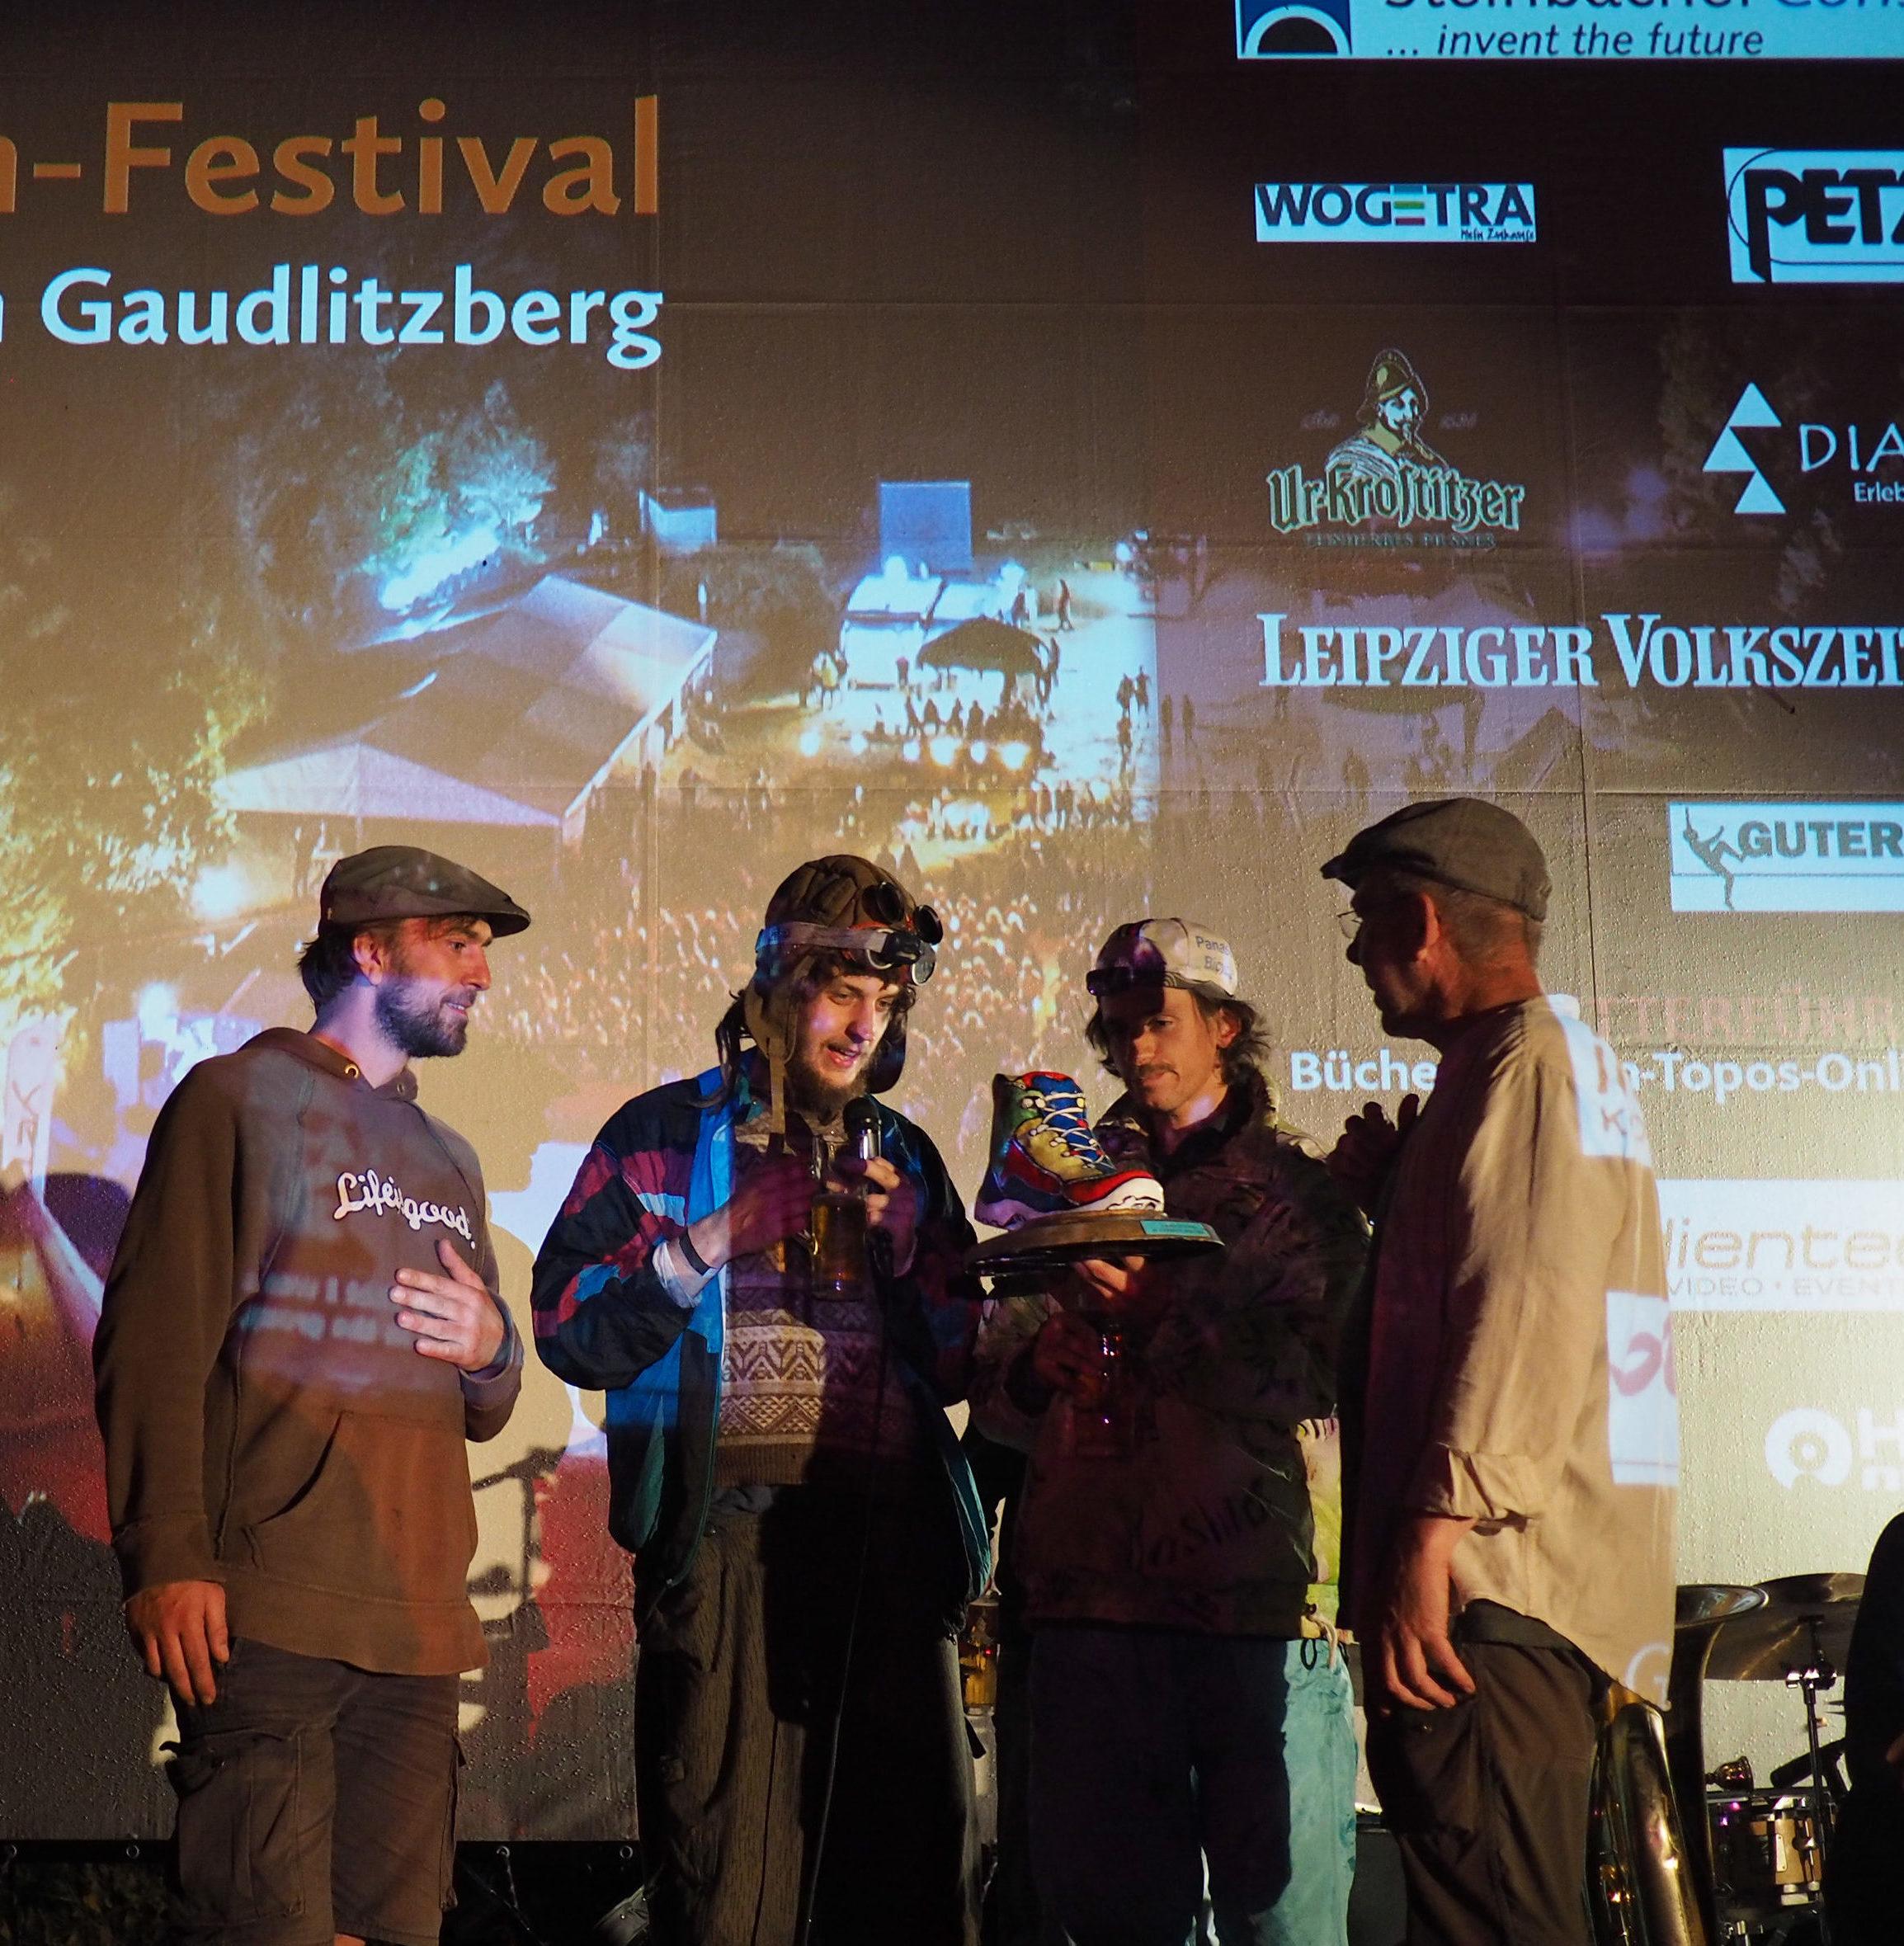 rothaarigen festival niederlande 2017